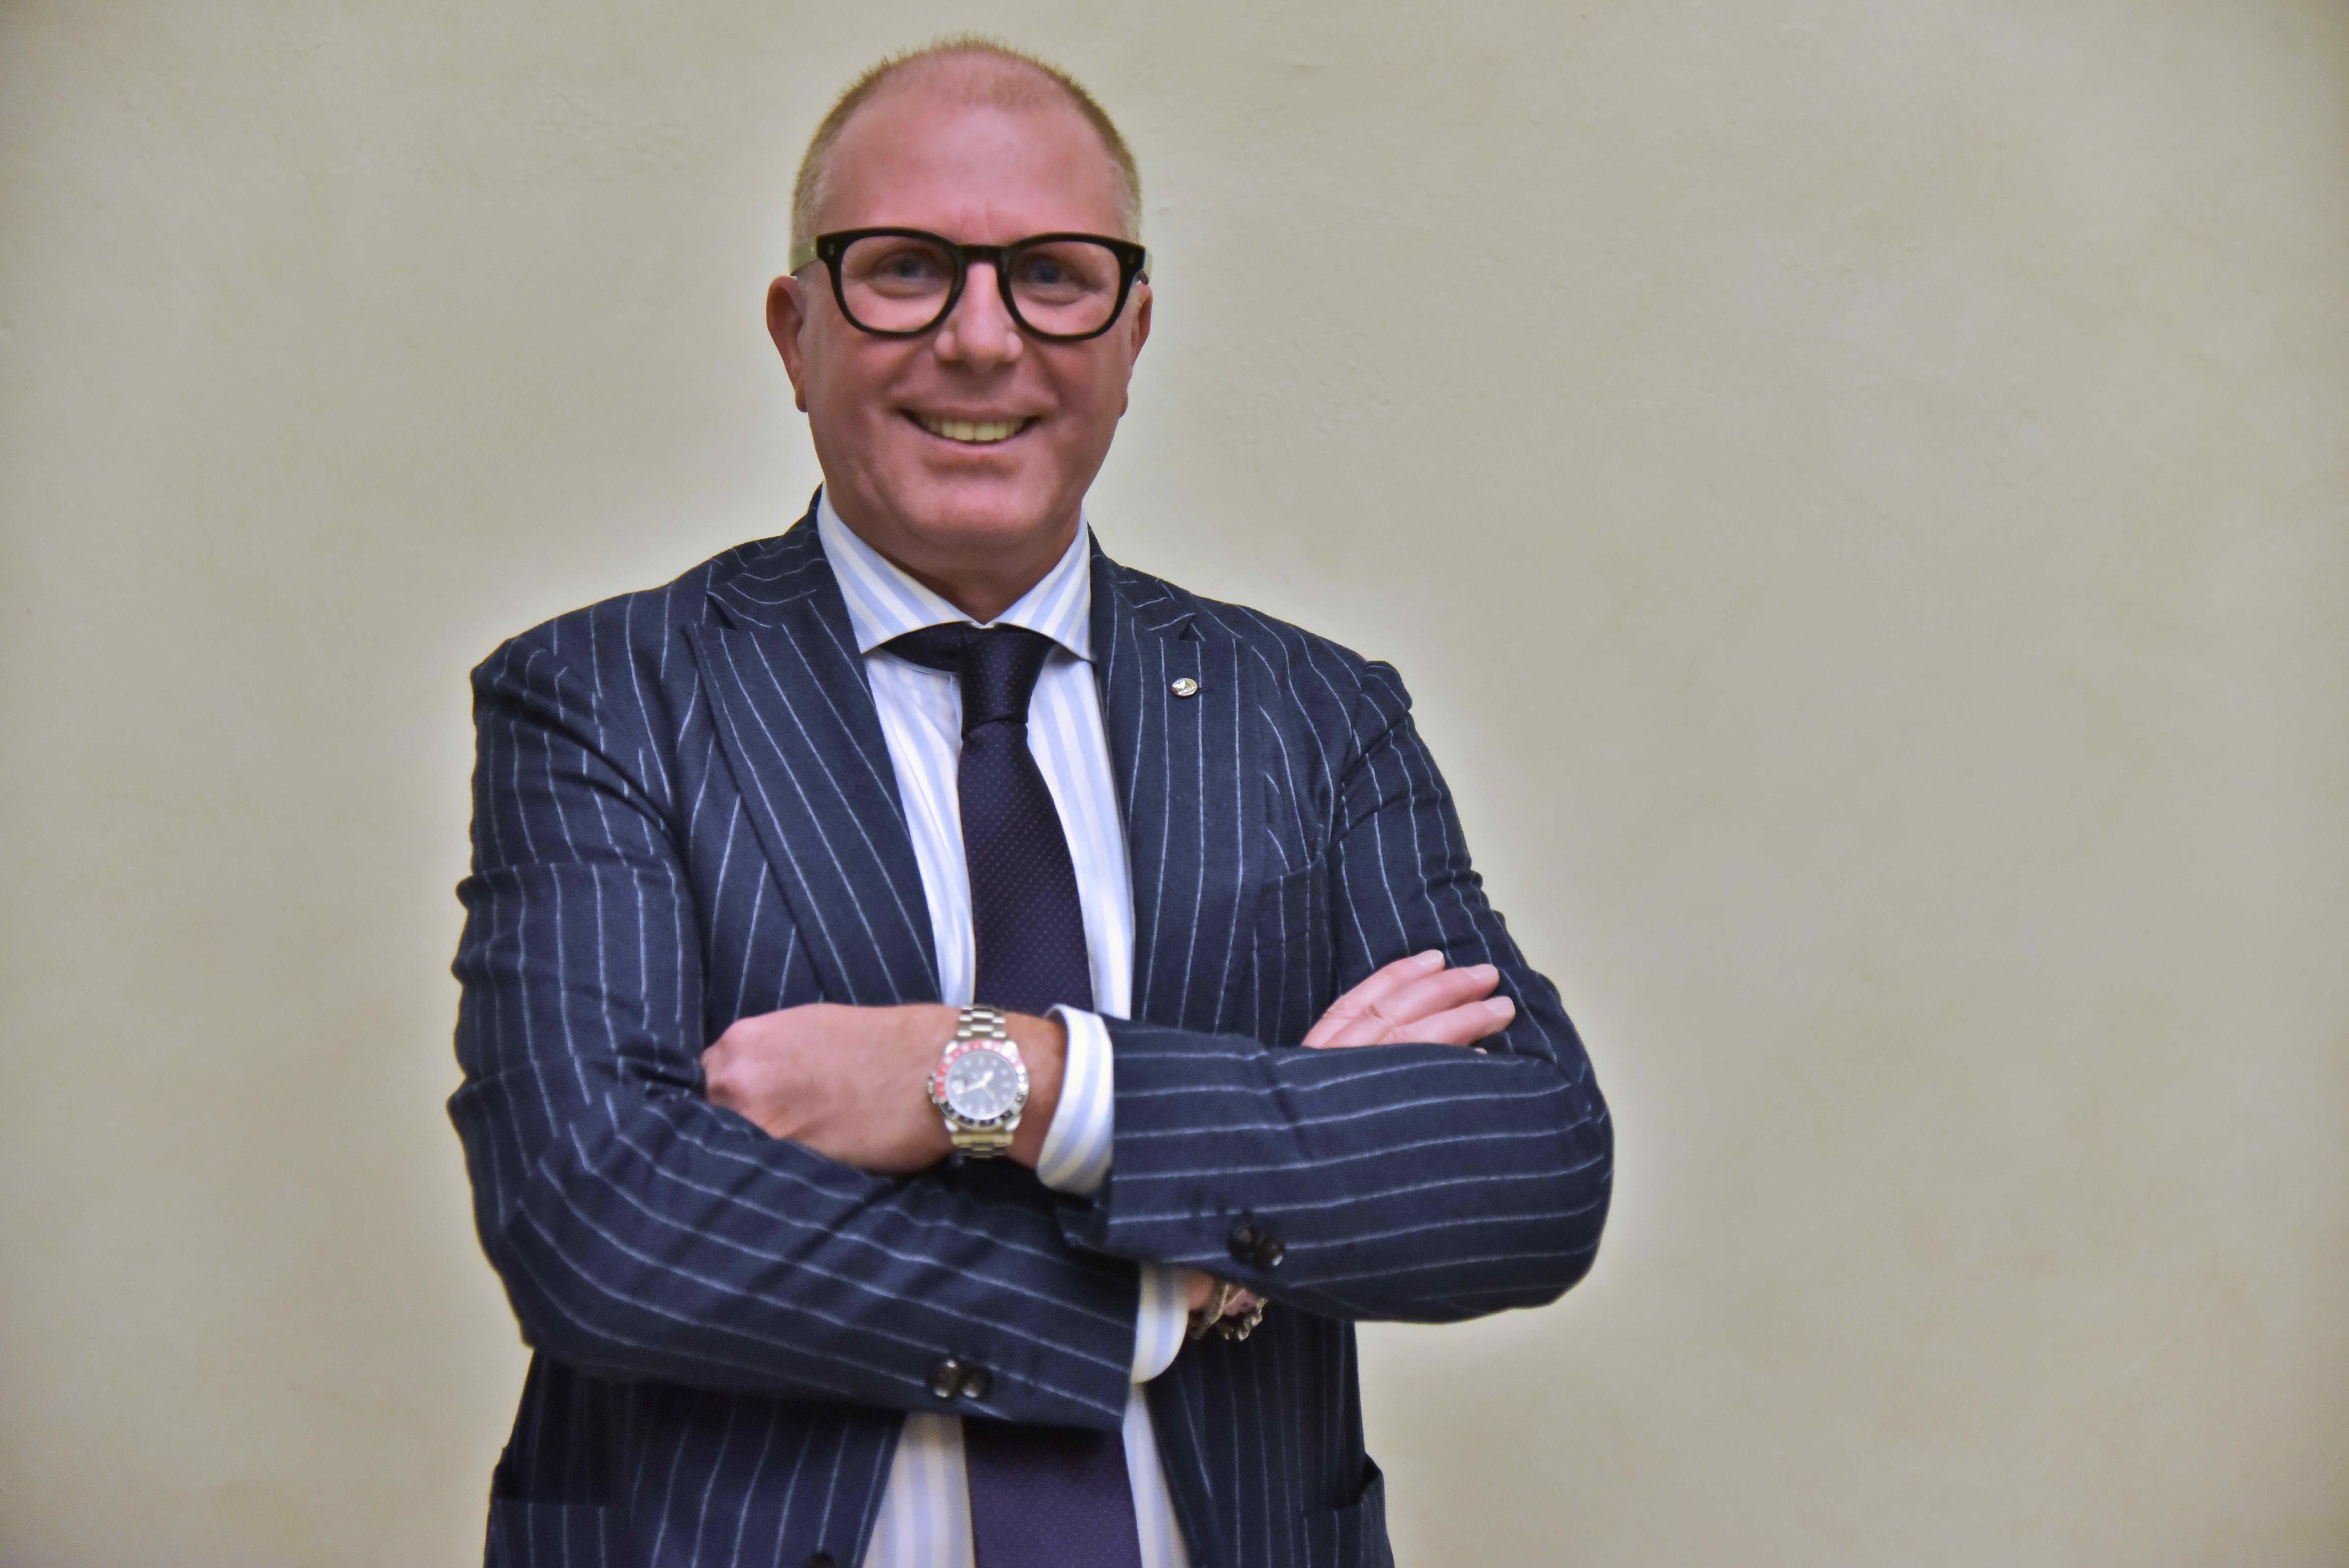 Oscar Caironi, presidente Fimaa Bergamo e coordinatore Fimaa Lombardia